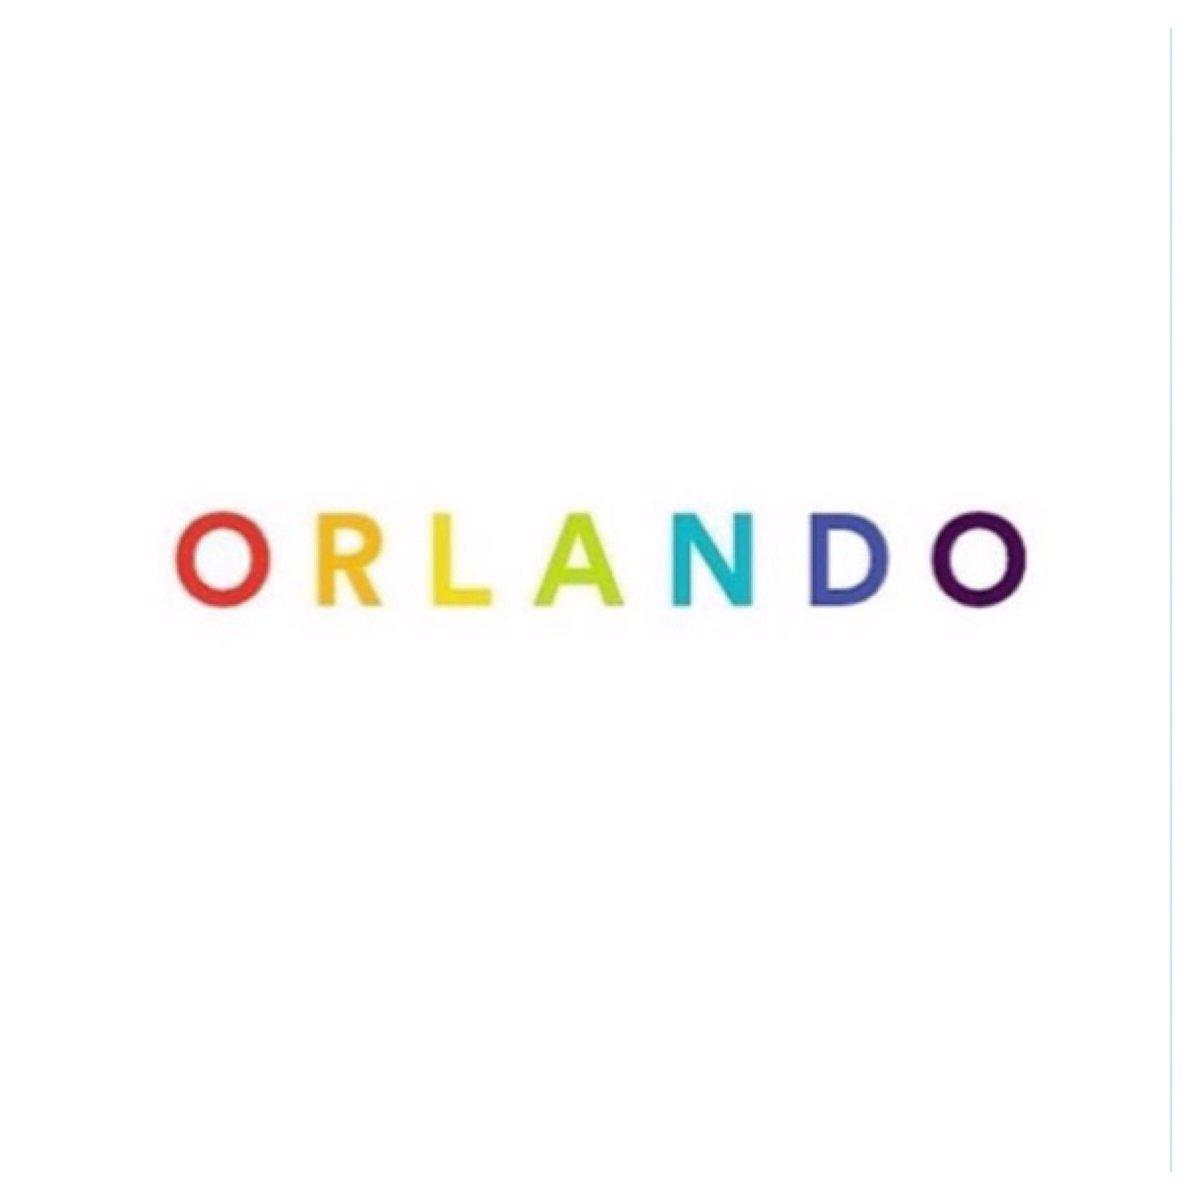 Pray for #Orlando https://t.co/Inm2yzQ98r